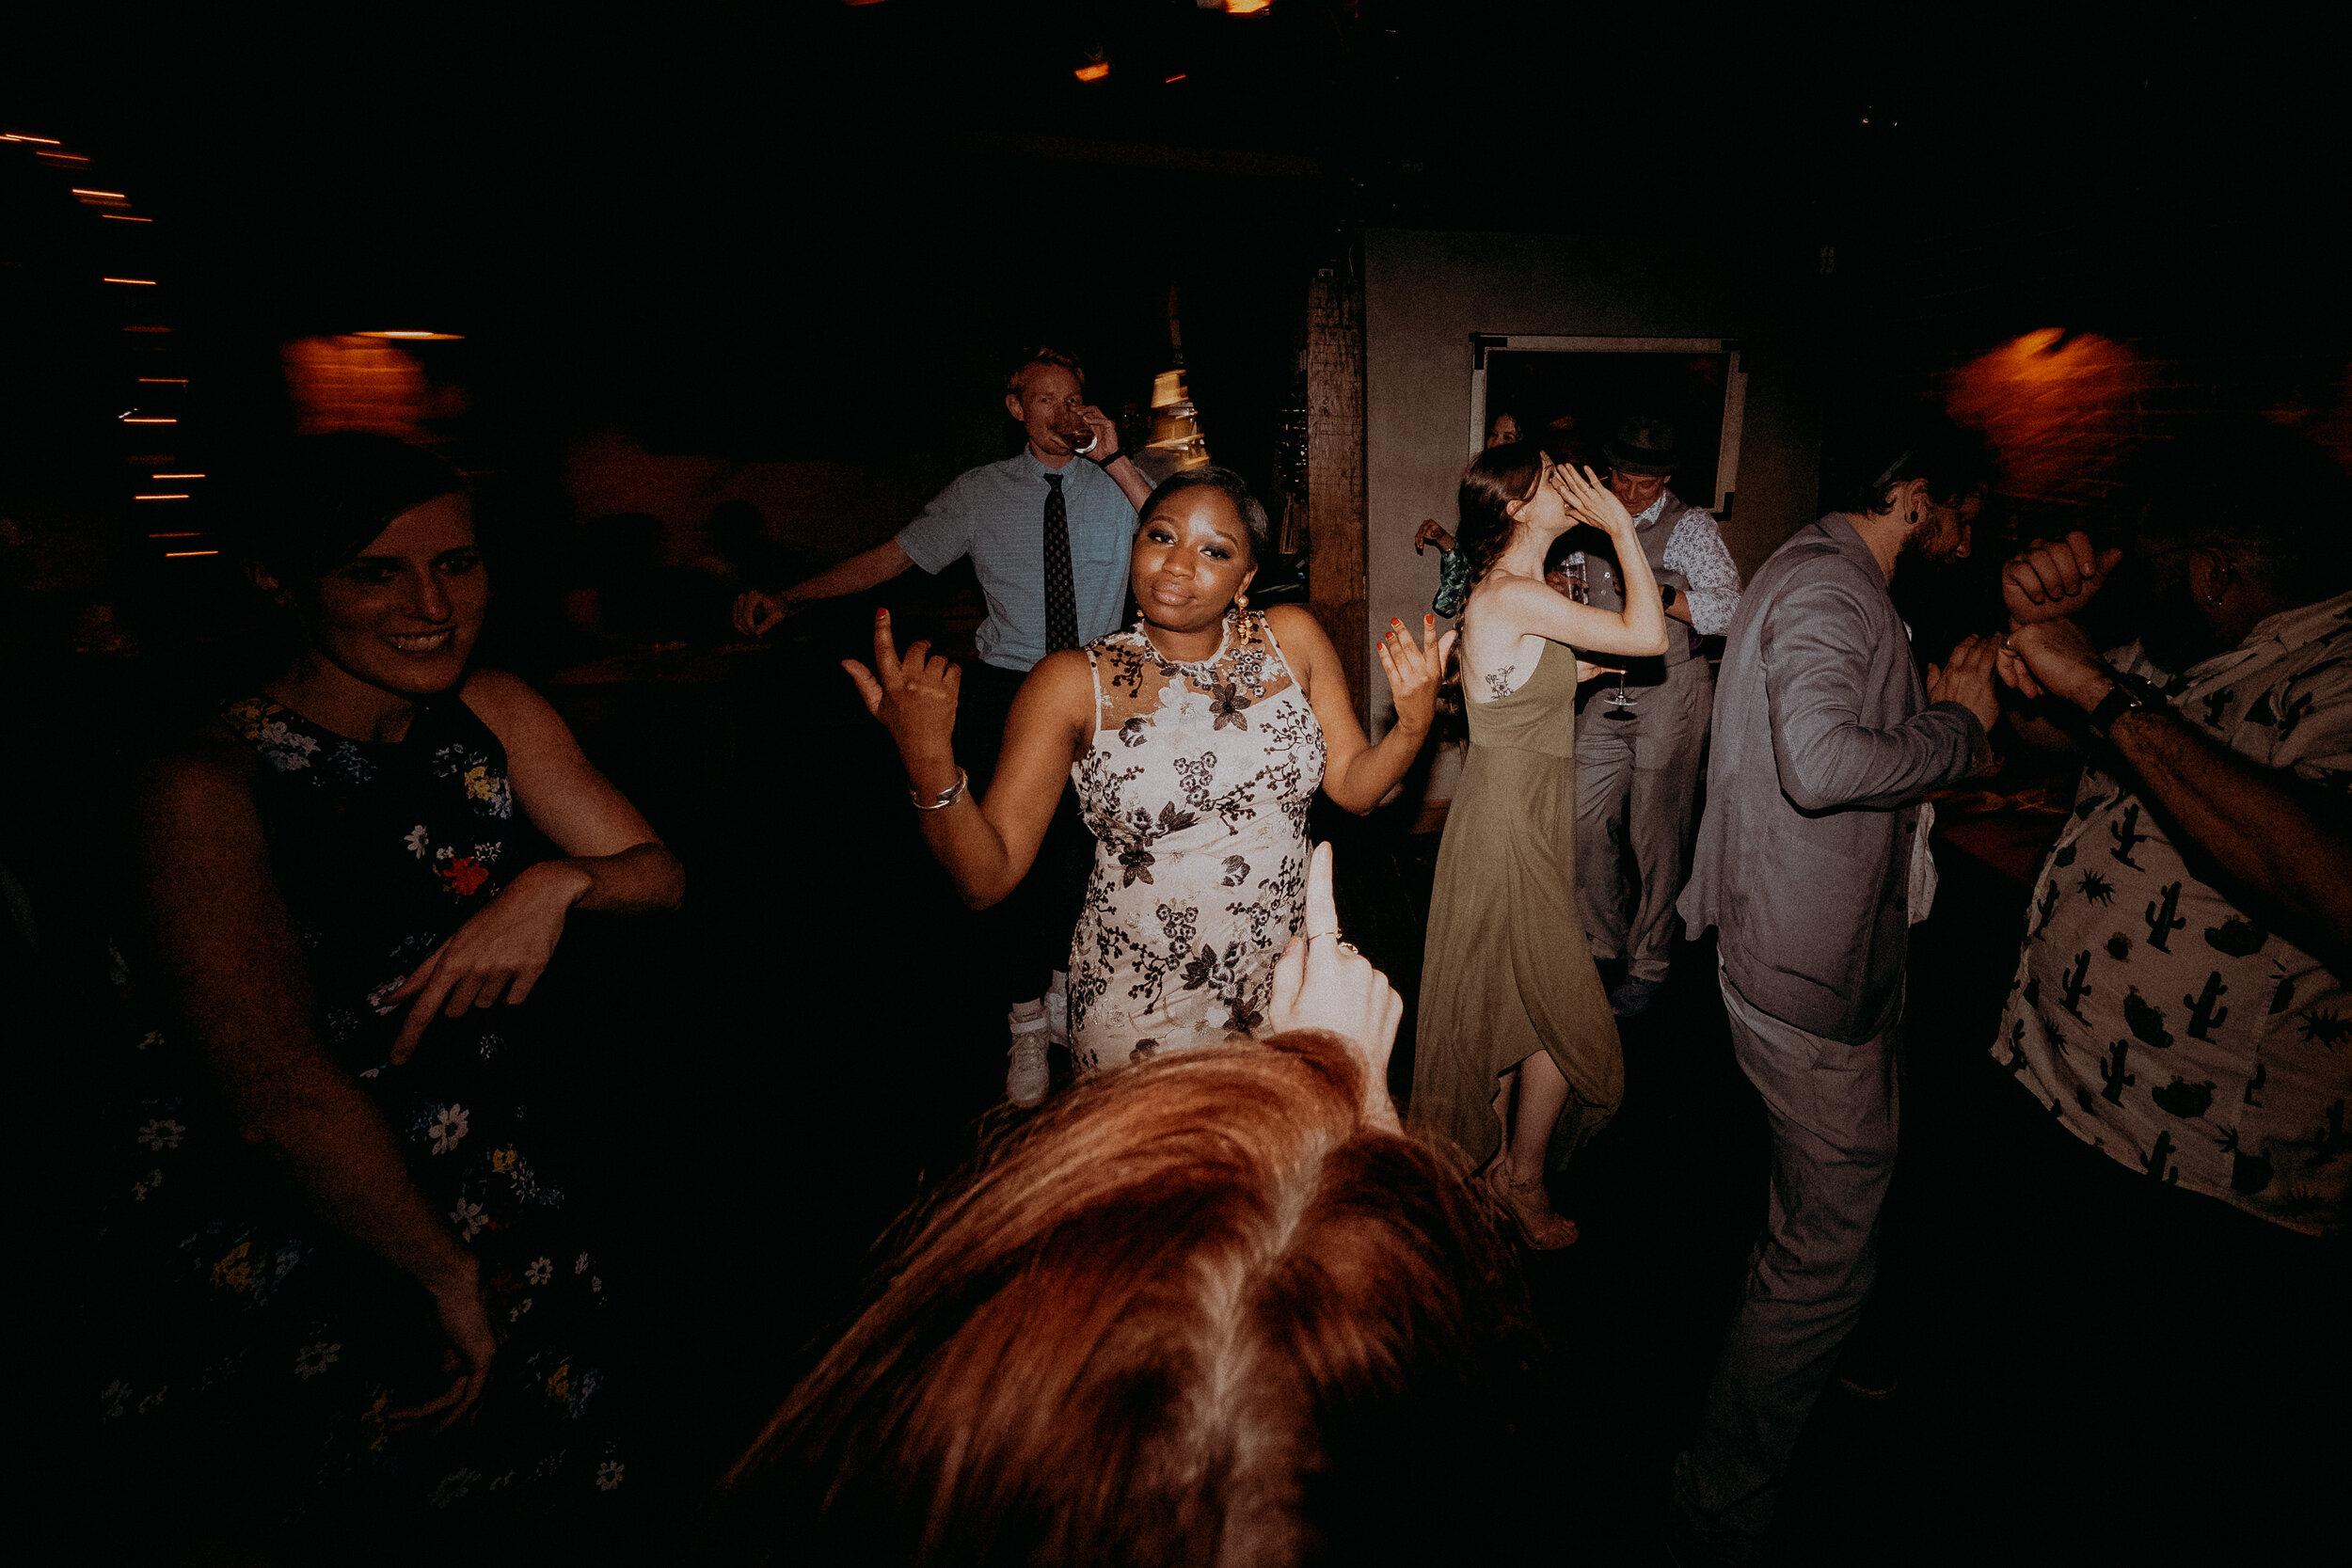 Aurora_Brooklyn_Wedding_Photographer_Chellise_Michael_Photography-542.jpg